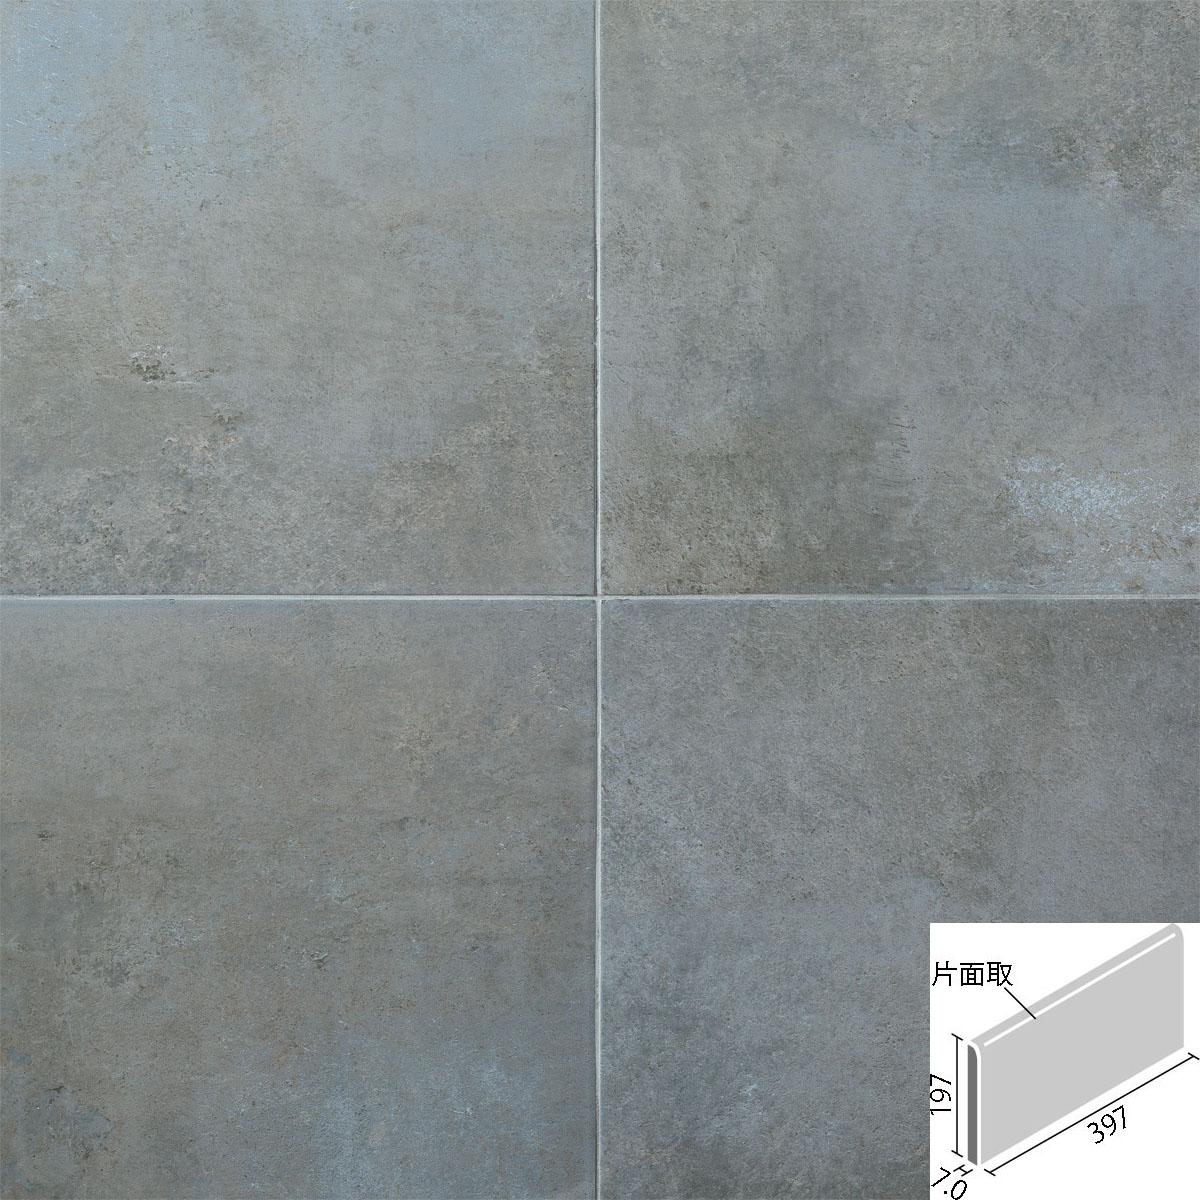 LIXIL(INAX) ビターメタル 400x200mm角片面取(長辺) ID-4260/BMA-2(U)